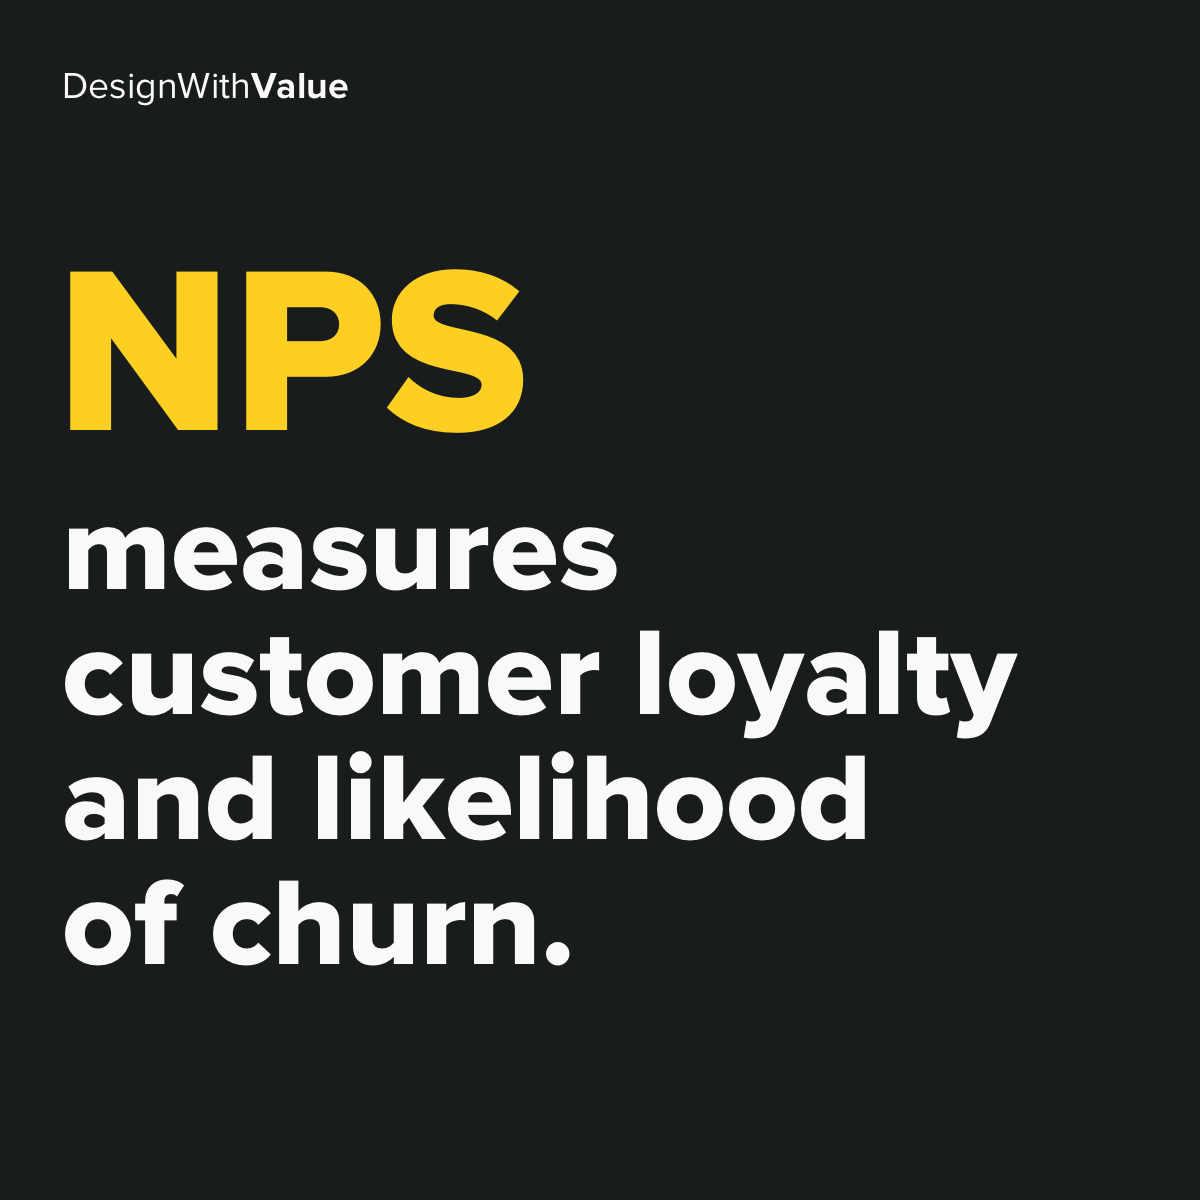 NPS measures customer loyalty and likelihood of churn.